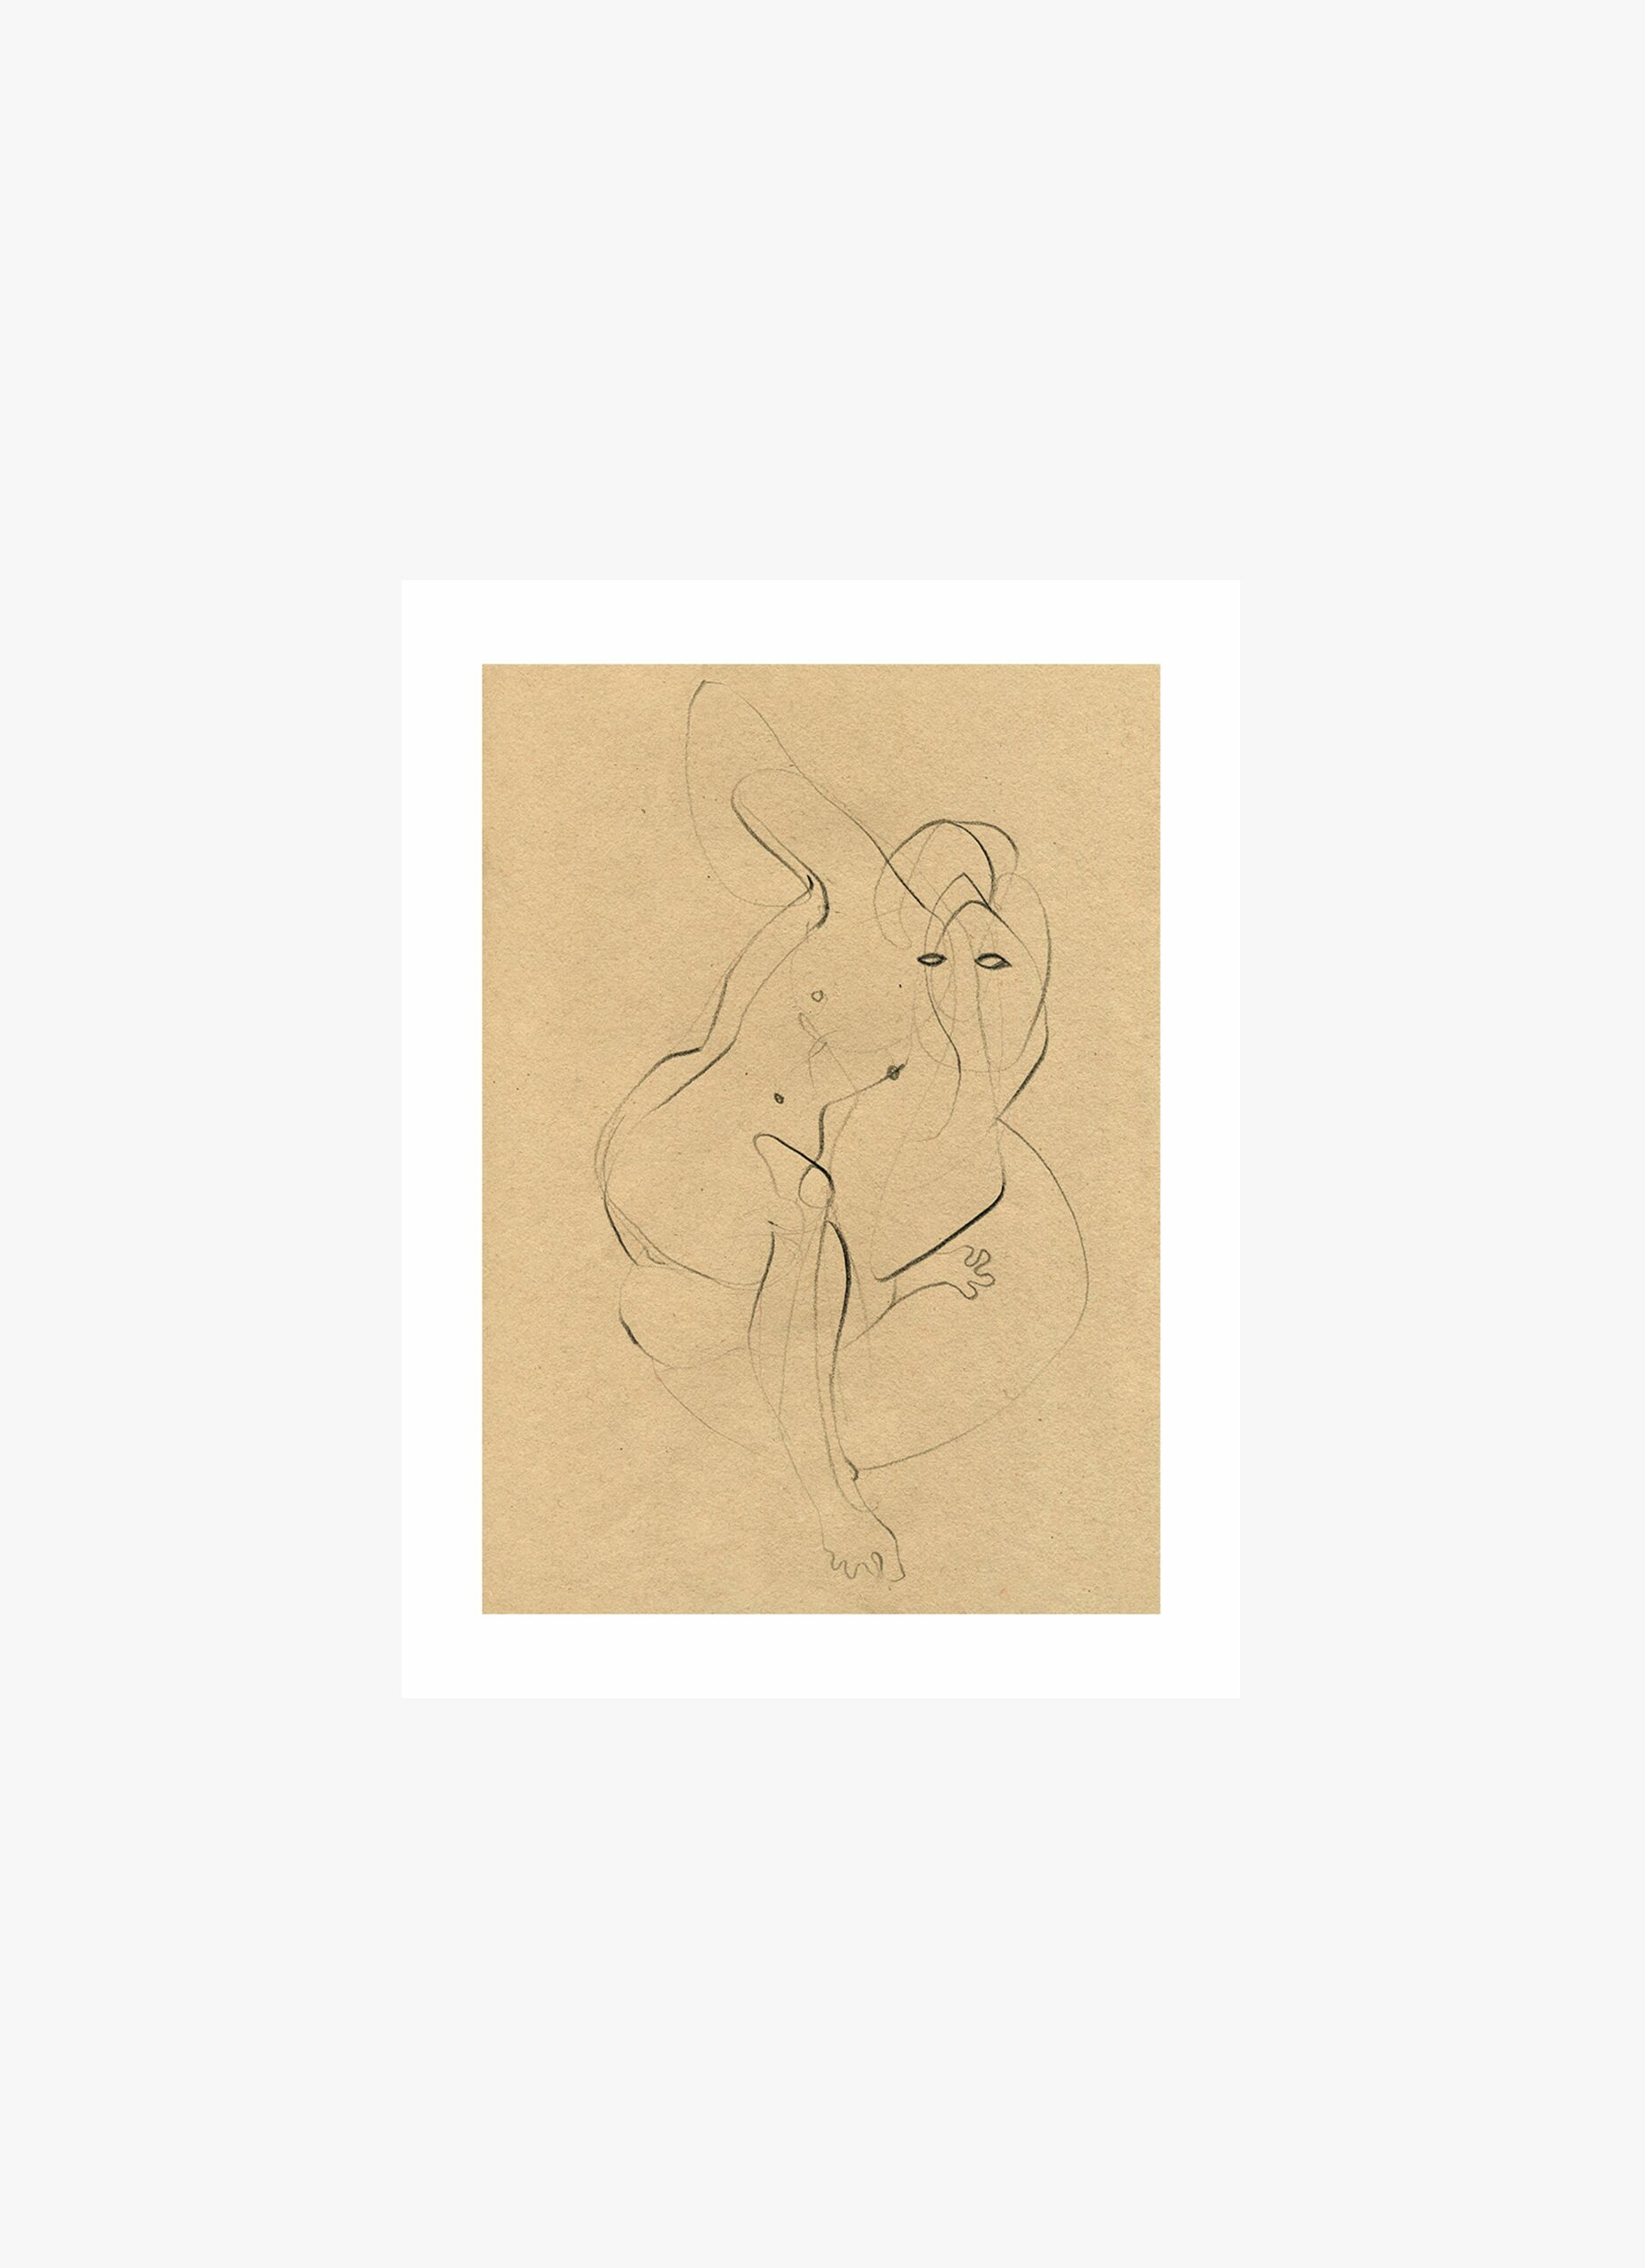 Ekaterina Koroleva - Art Print - Dynamic Drawing - 30x40cm